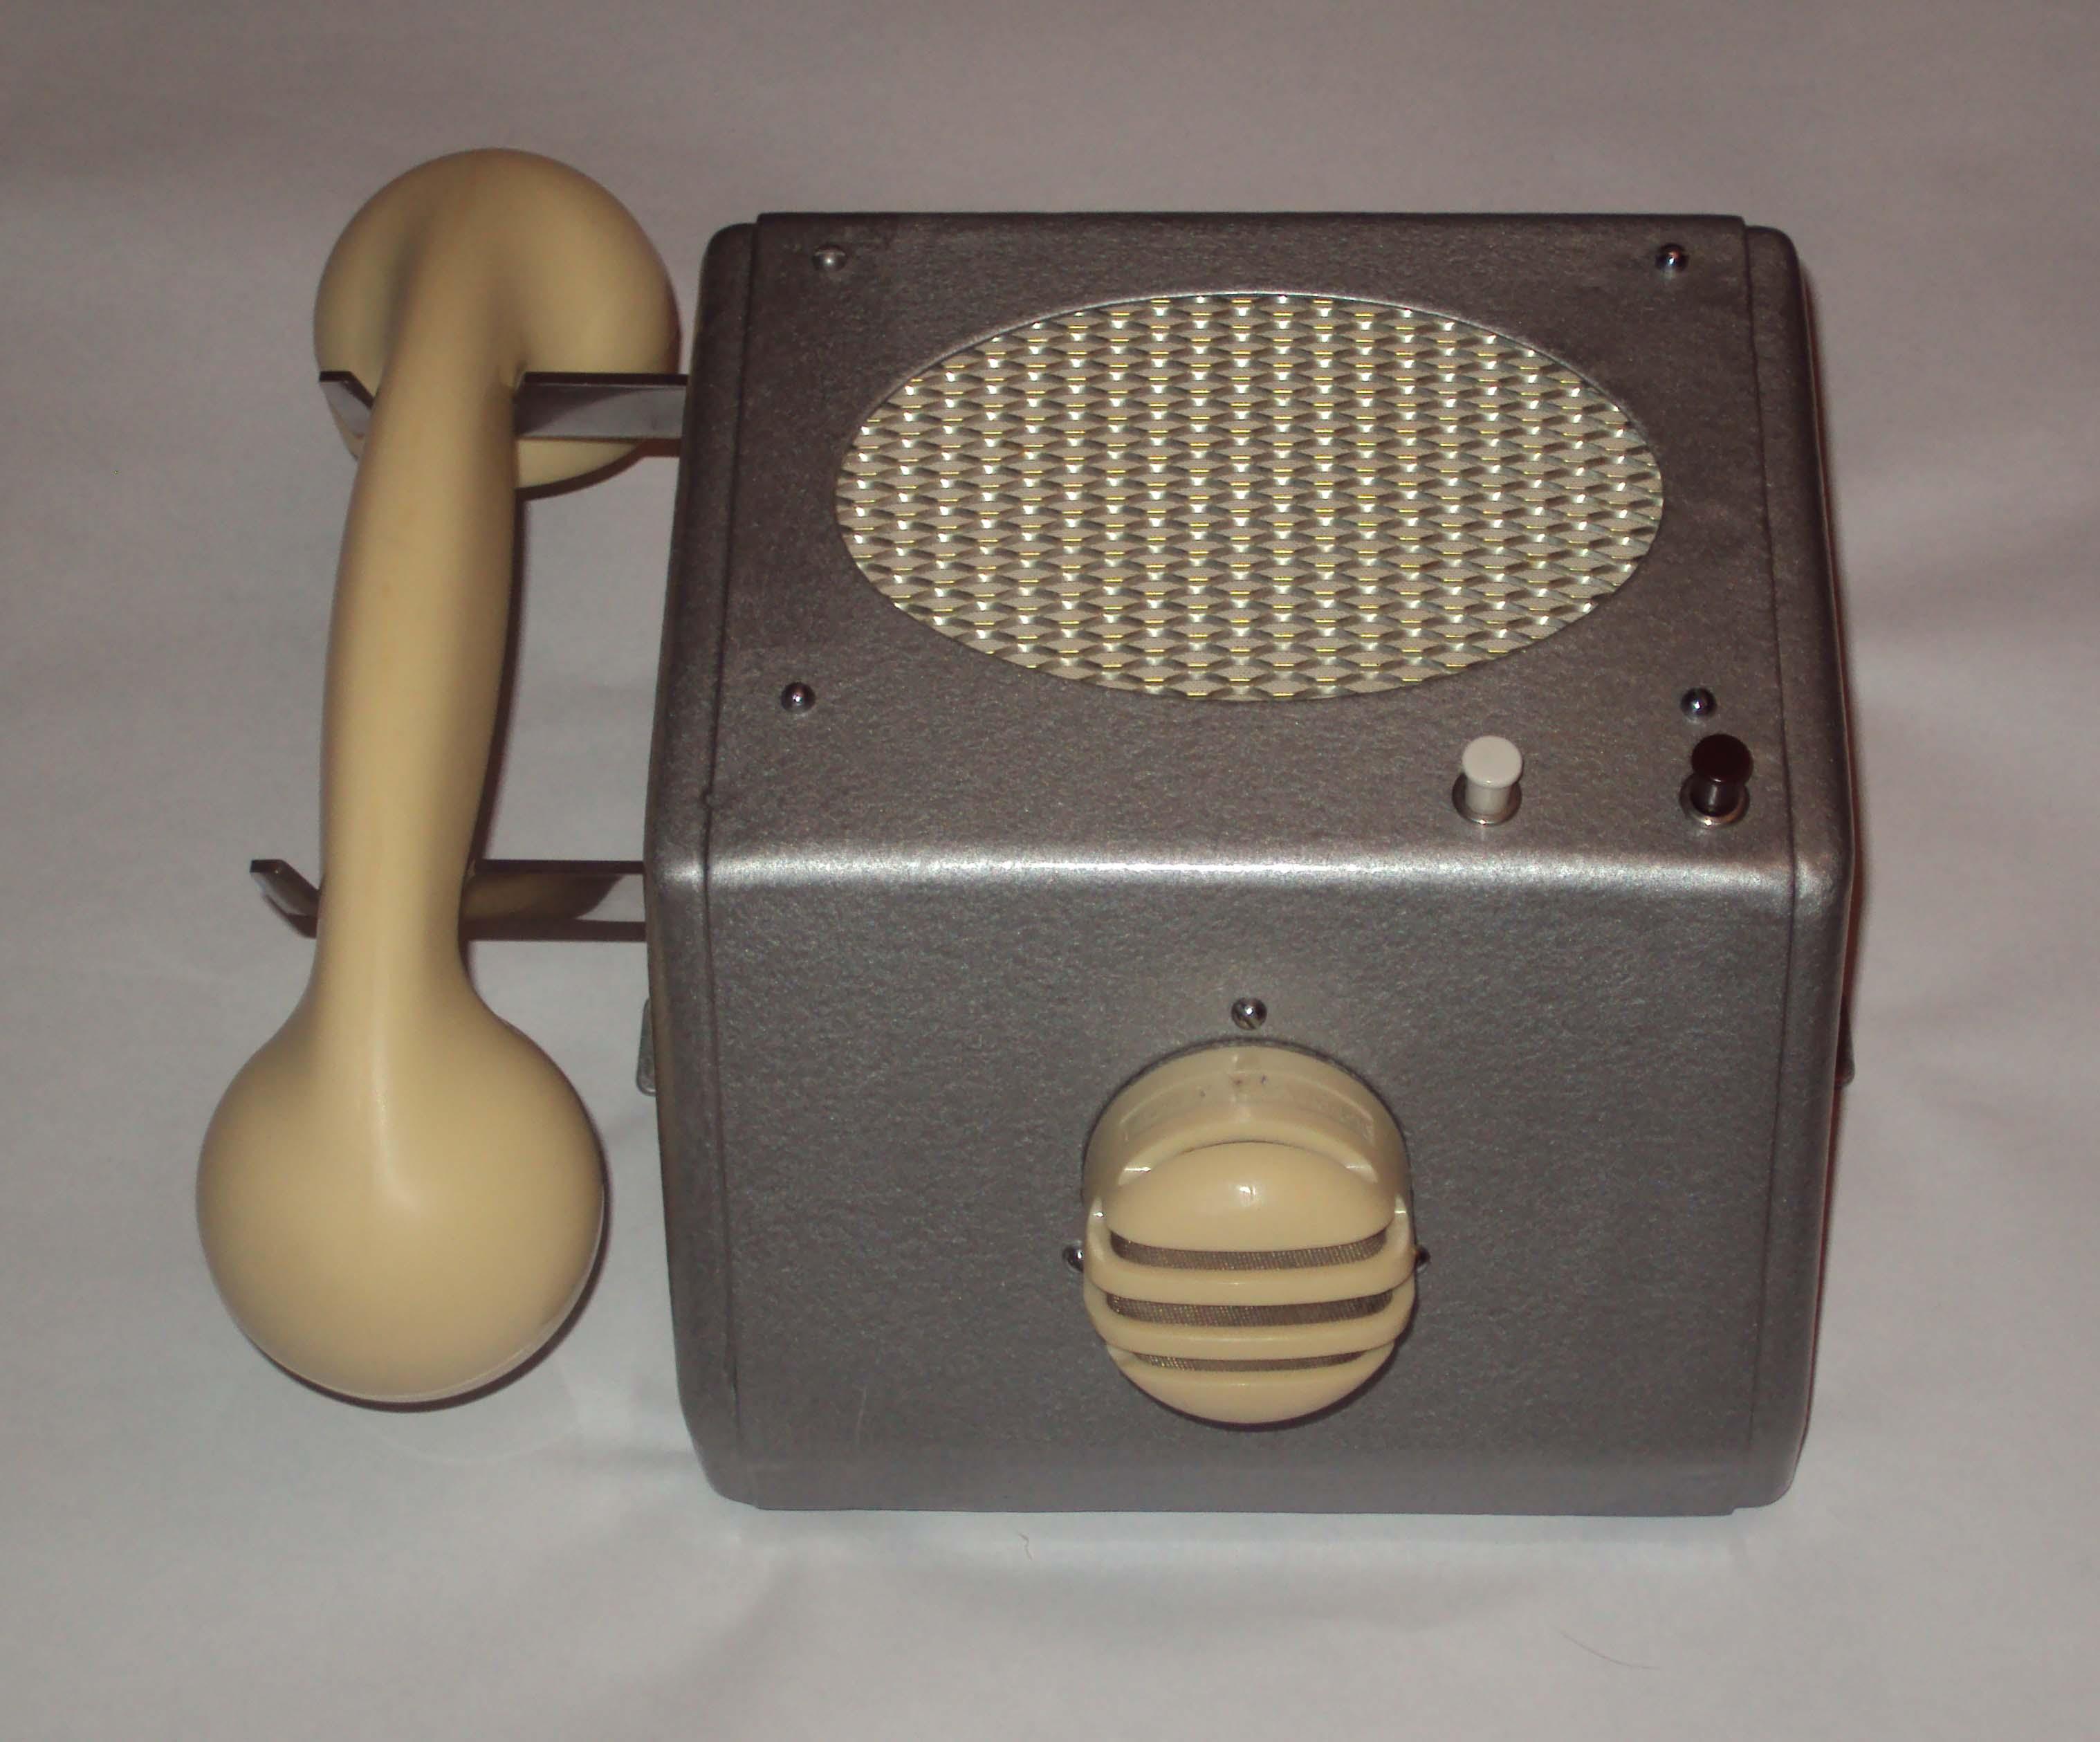 Nietypowy telefon/unifon